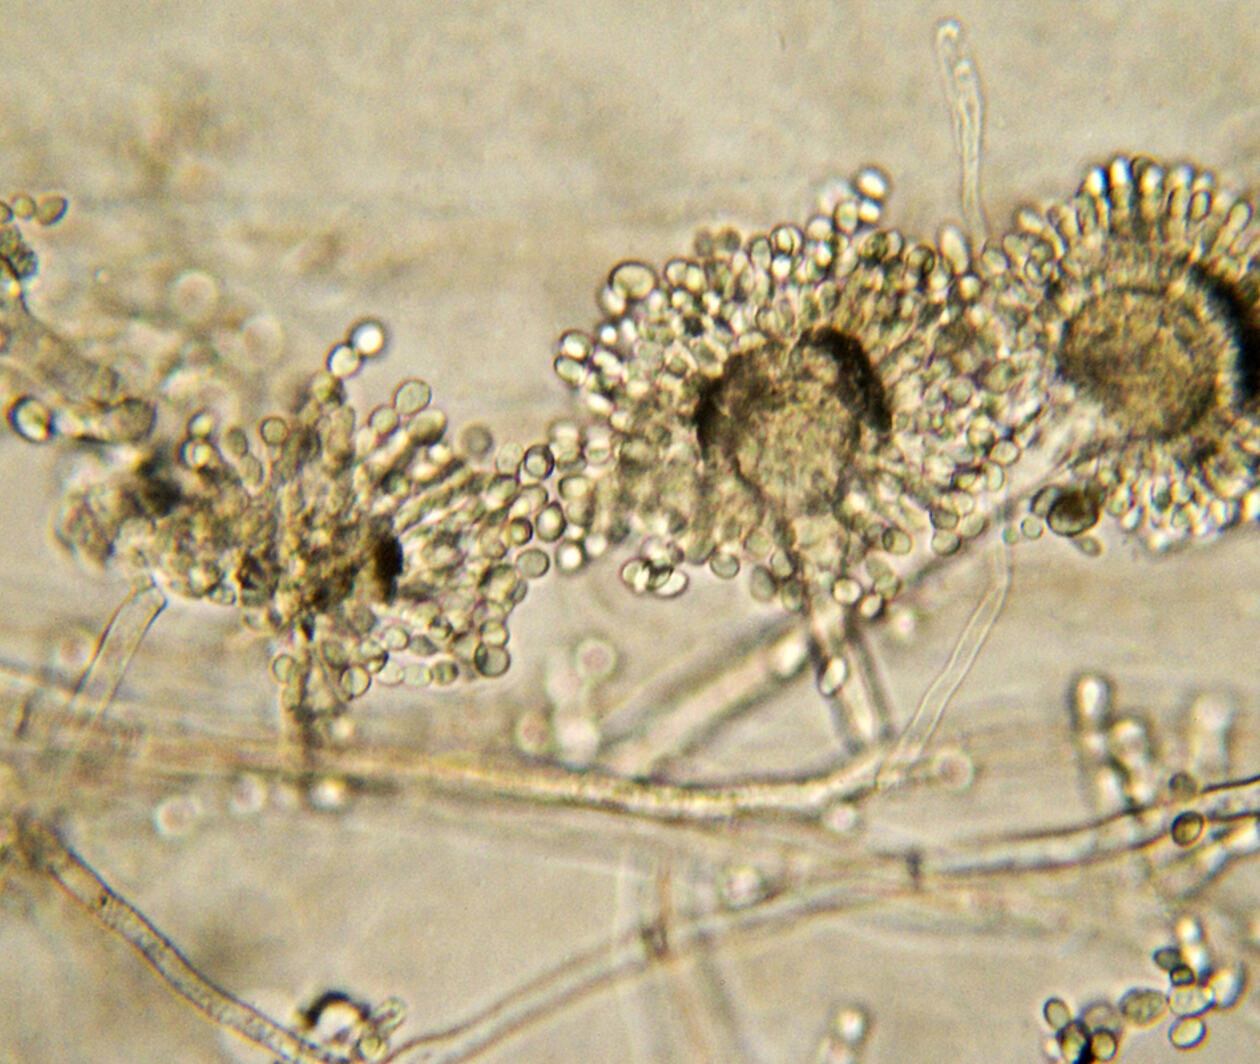 Fungal Diagnostics in Critically Ill Patients